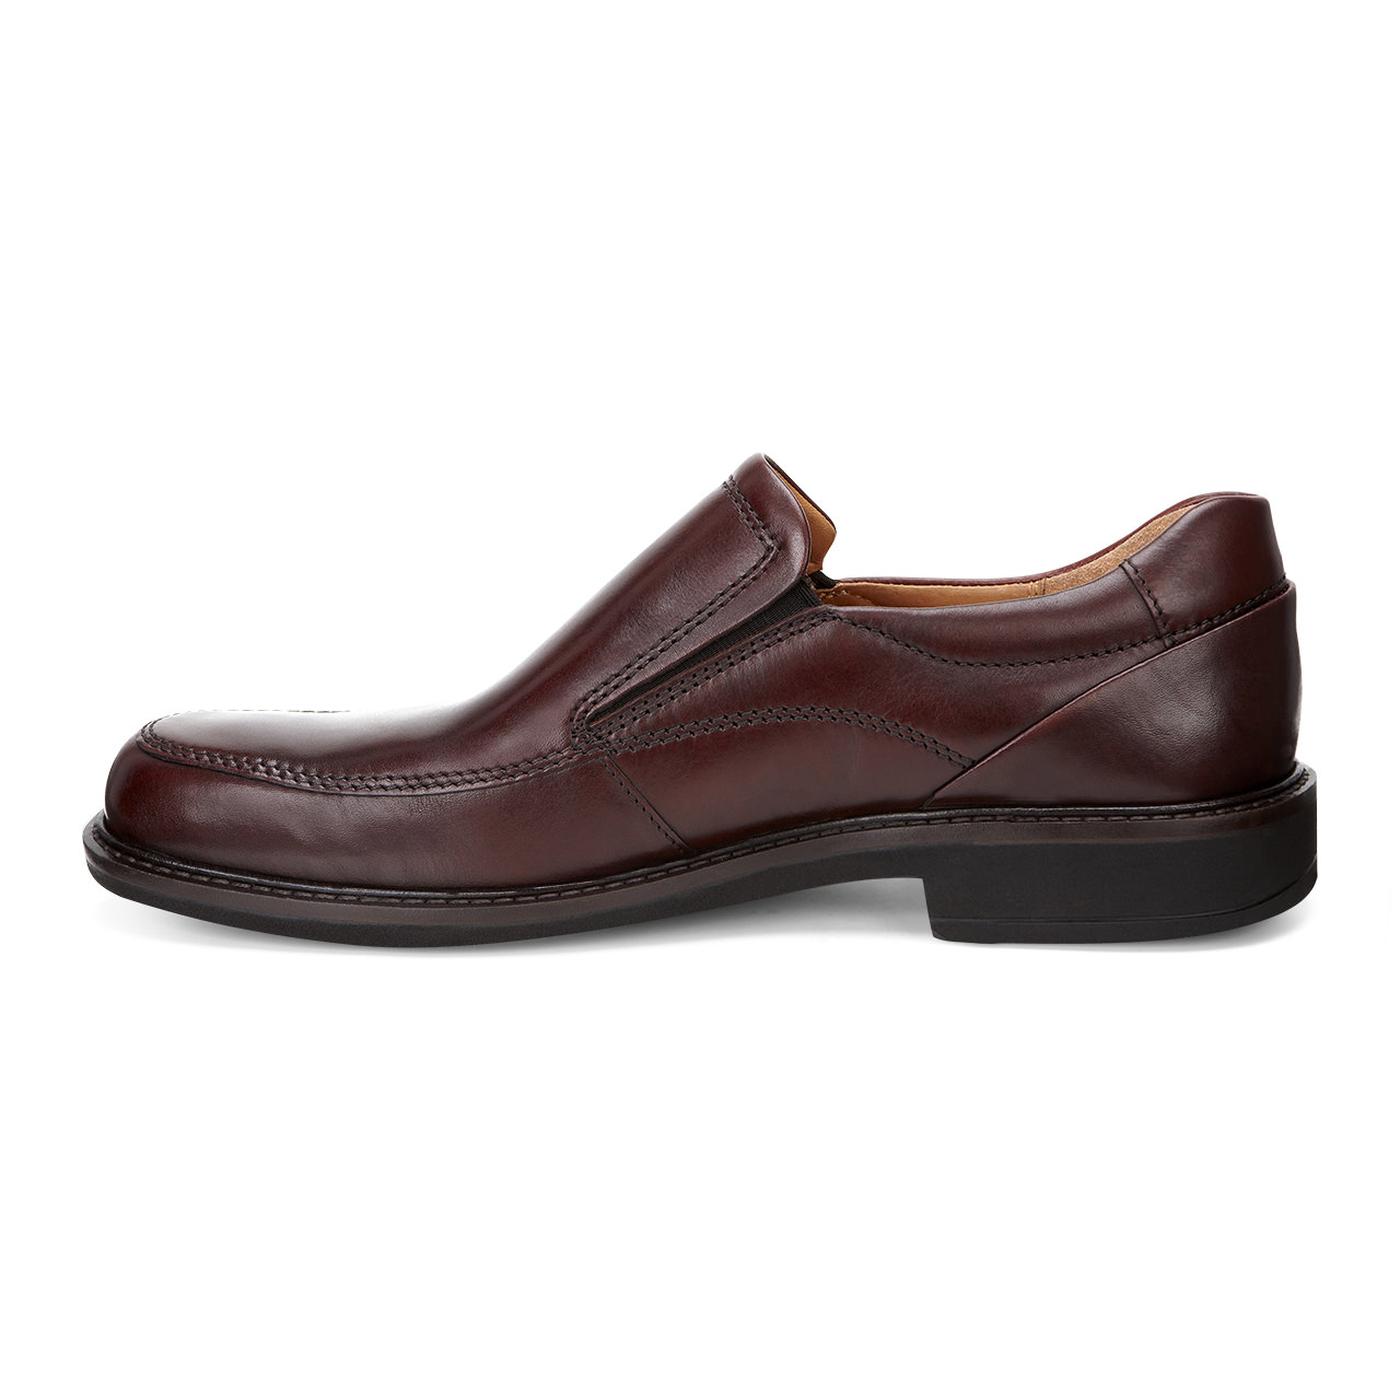 878b8ff5f36 ECCO Holton Apron Toe Slip On | Men's Shoes | ECCO® Shoes